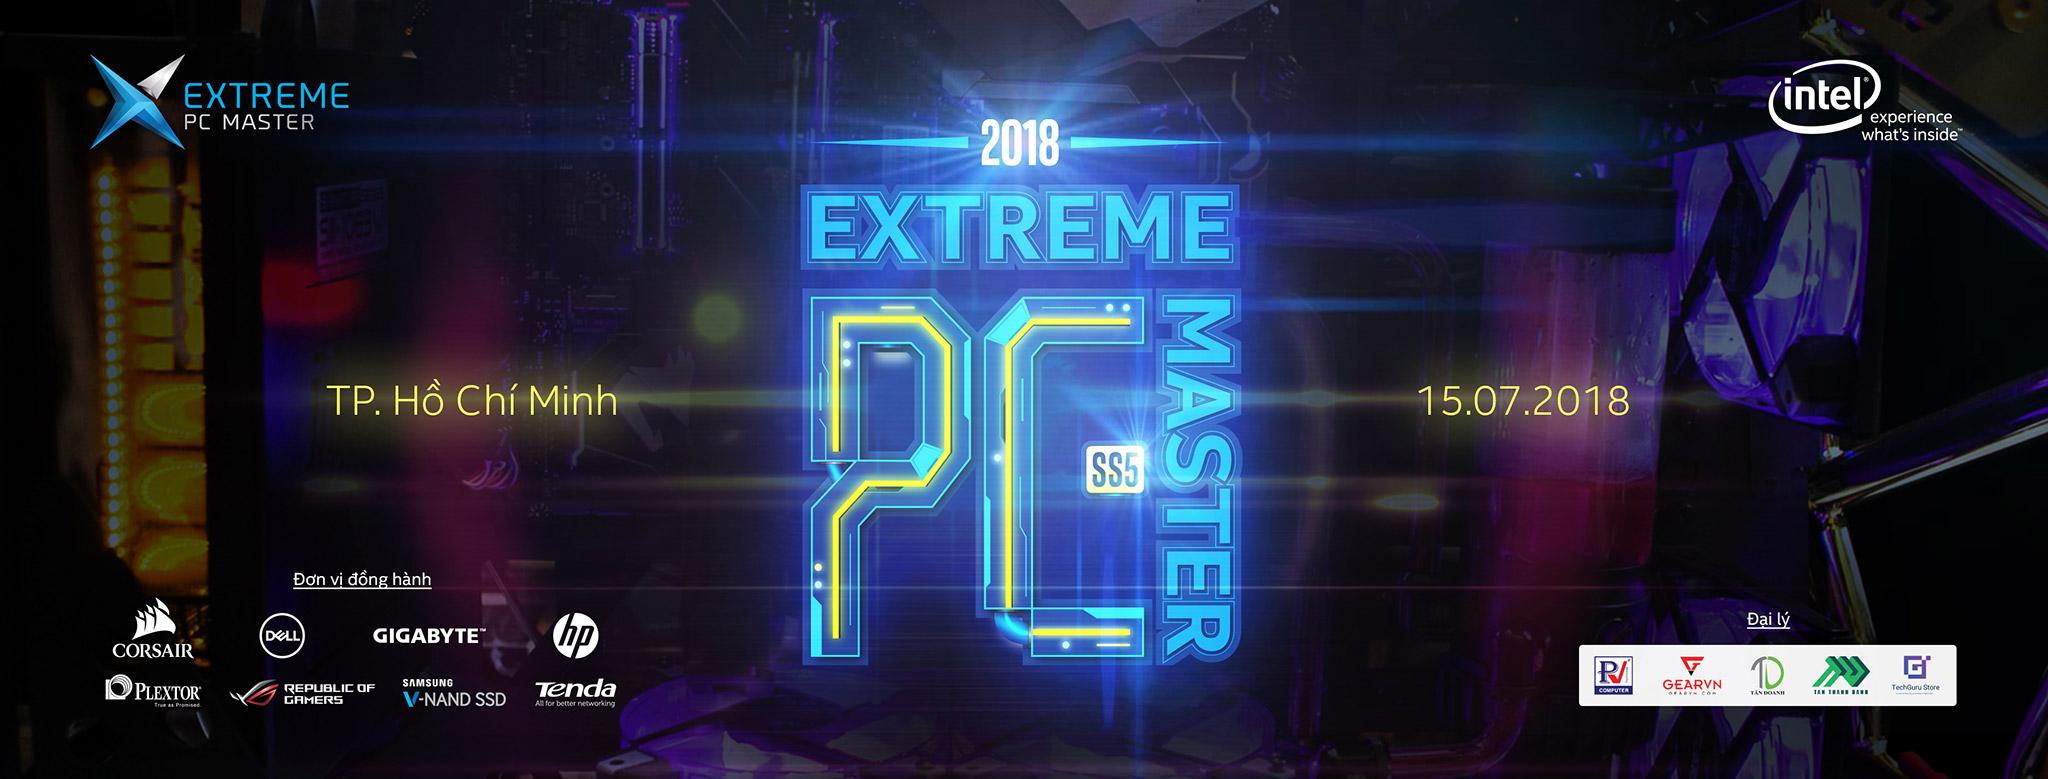 Intel Extreme PC Master_1.jpg